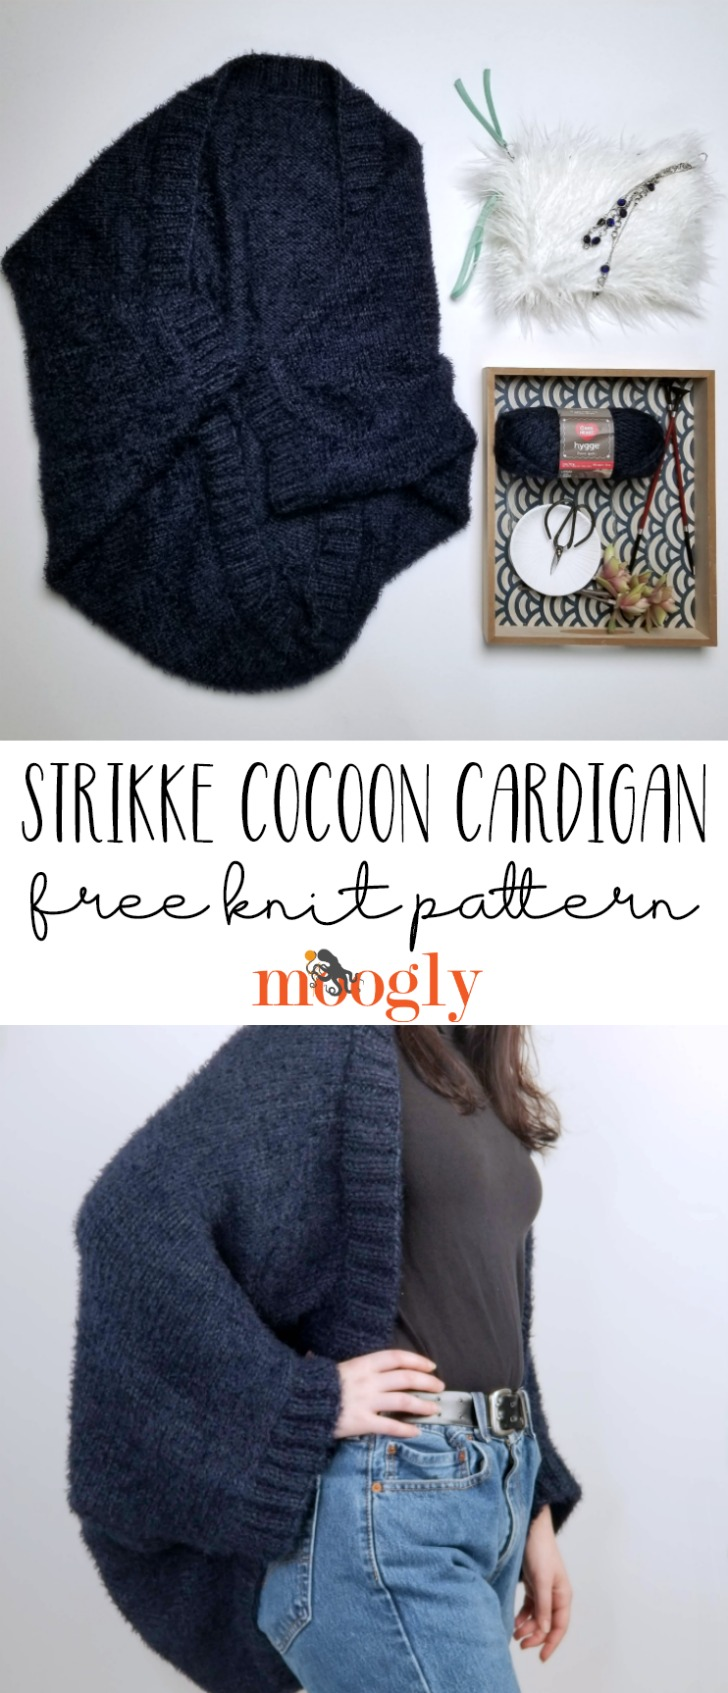 trikke Cocoon Cardigan - free knit pattern on Moogly!